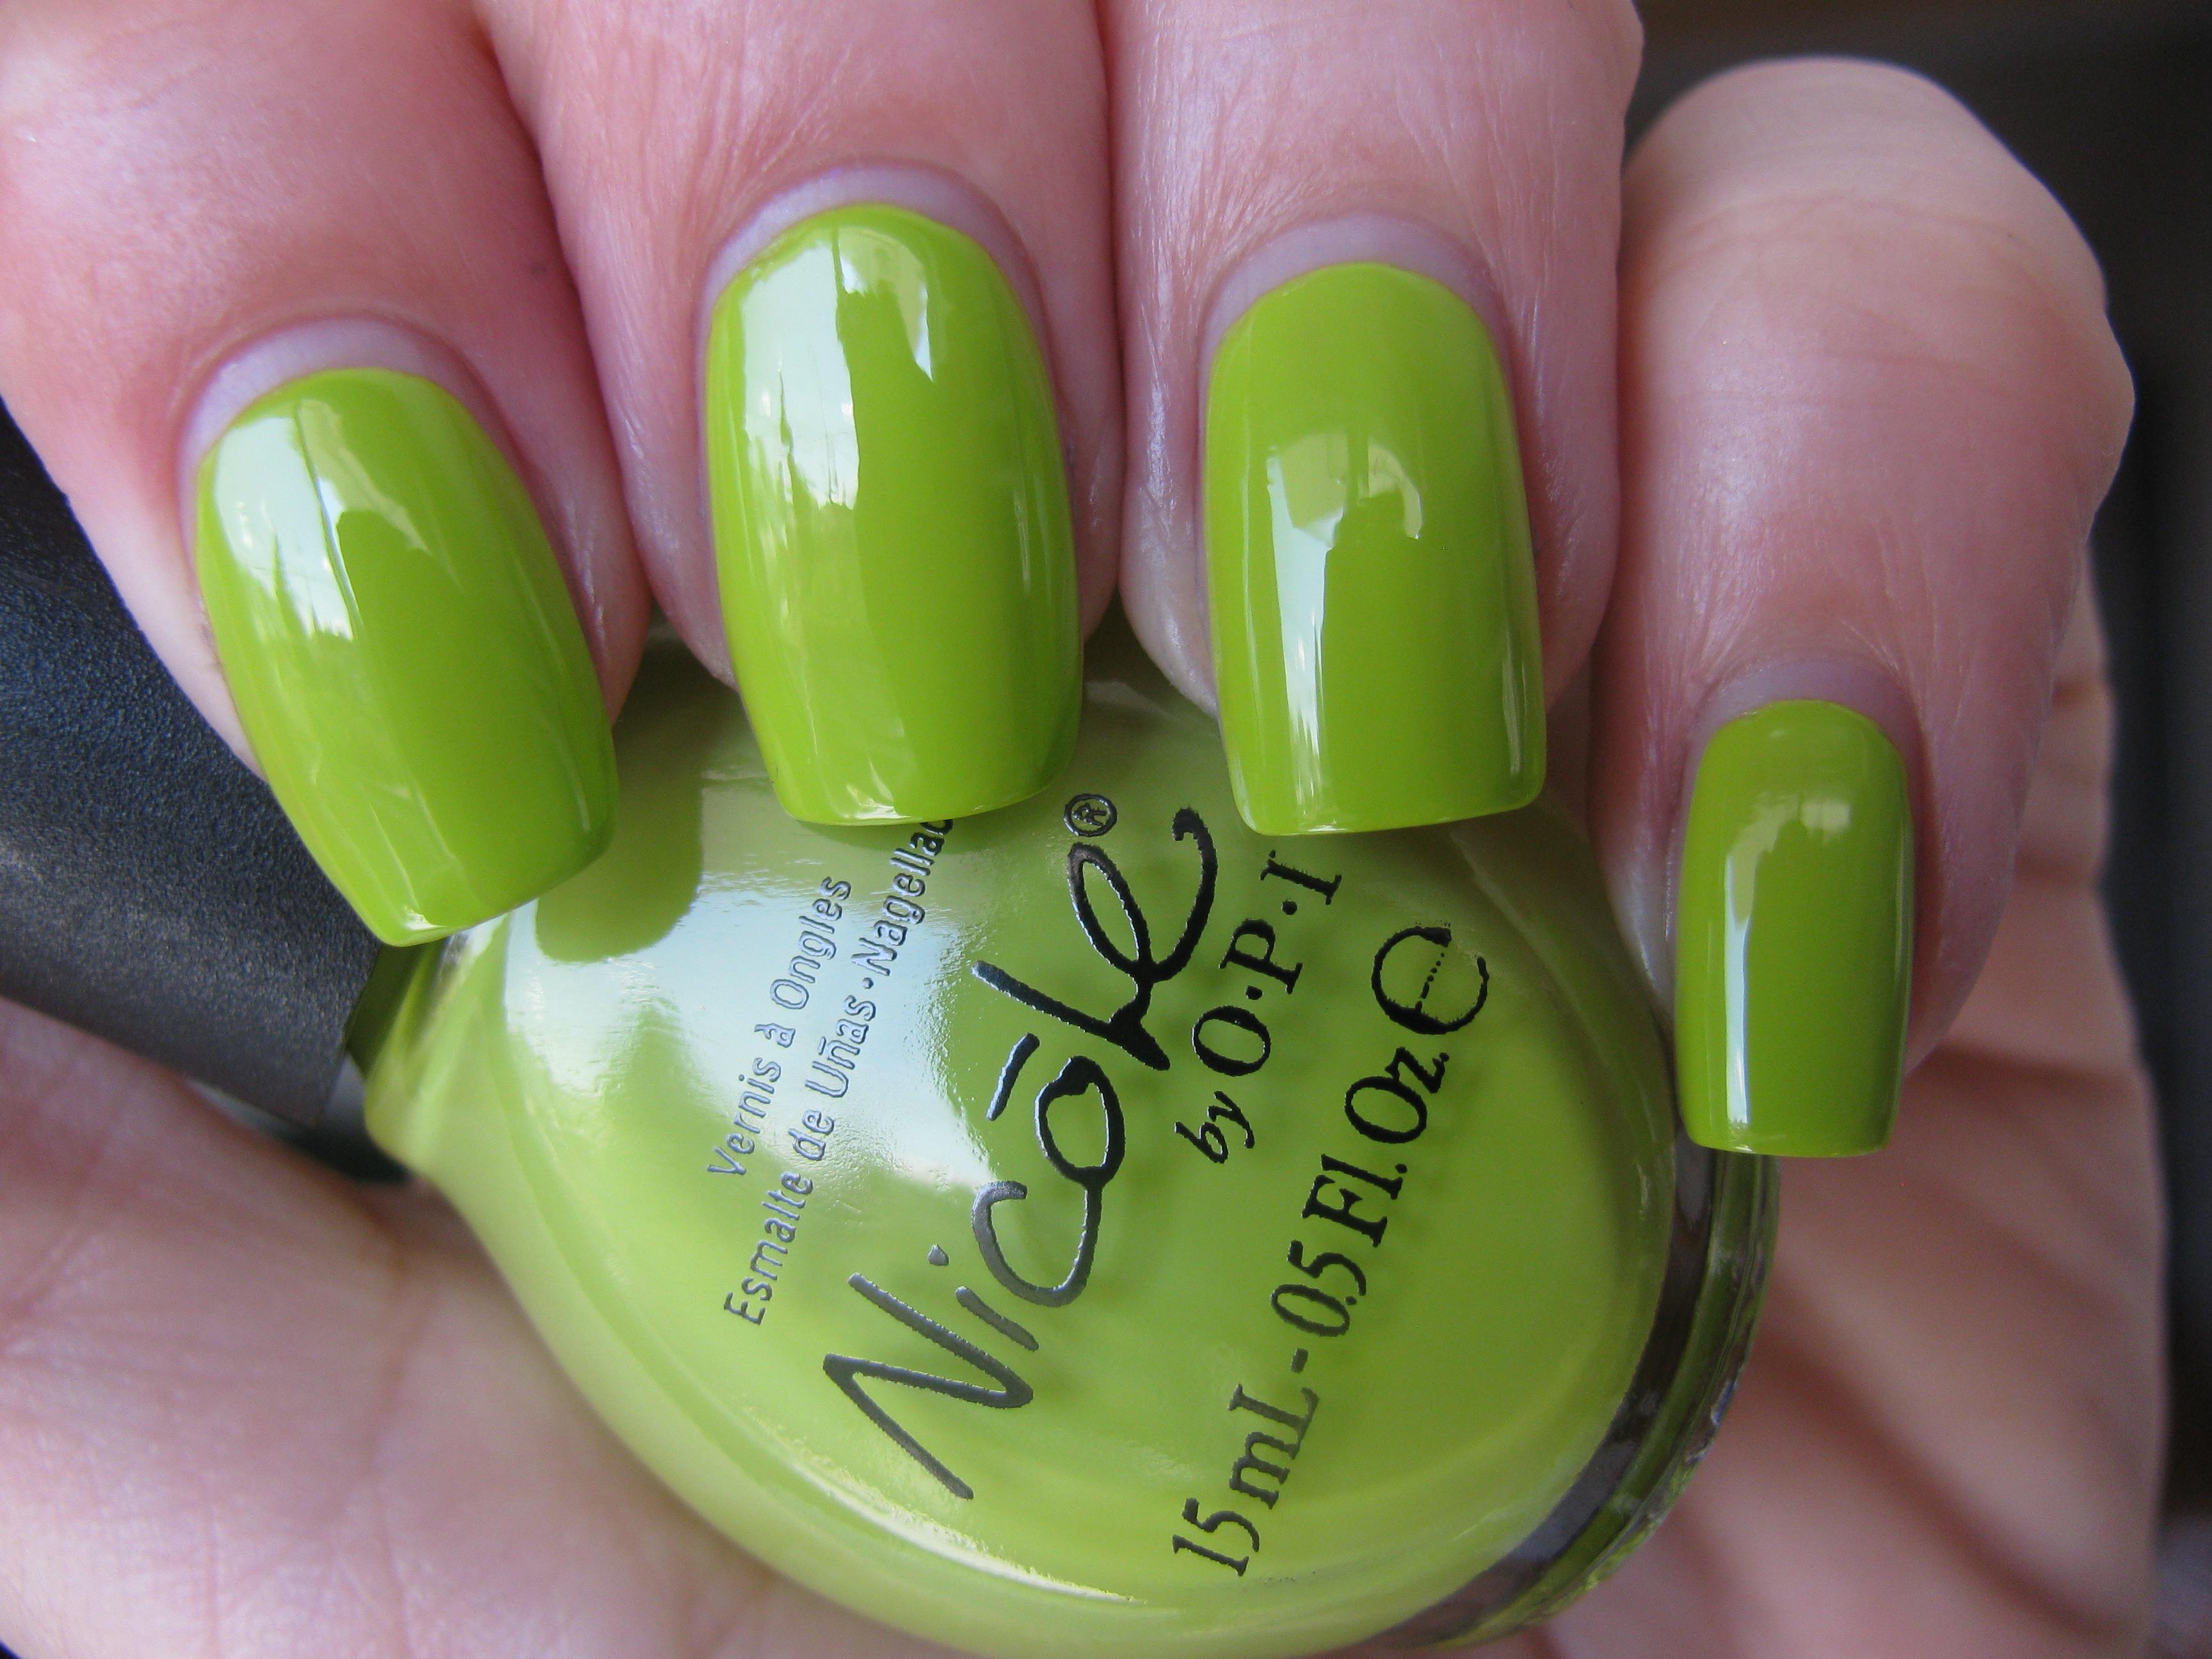 Nicole by OPI Twist of Fate swatch | ommorphia beauty bar